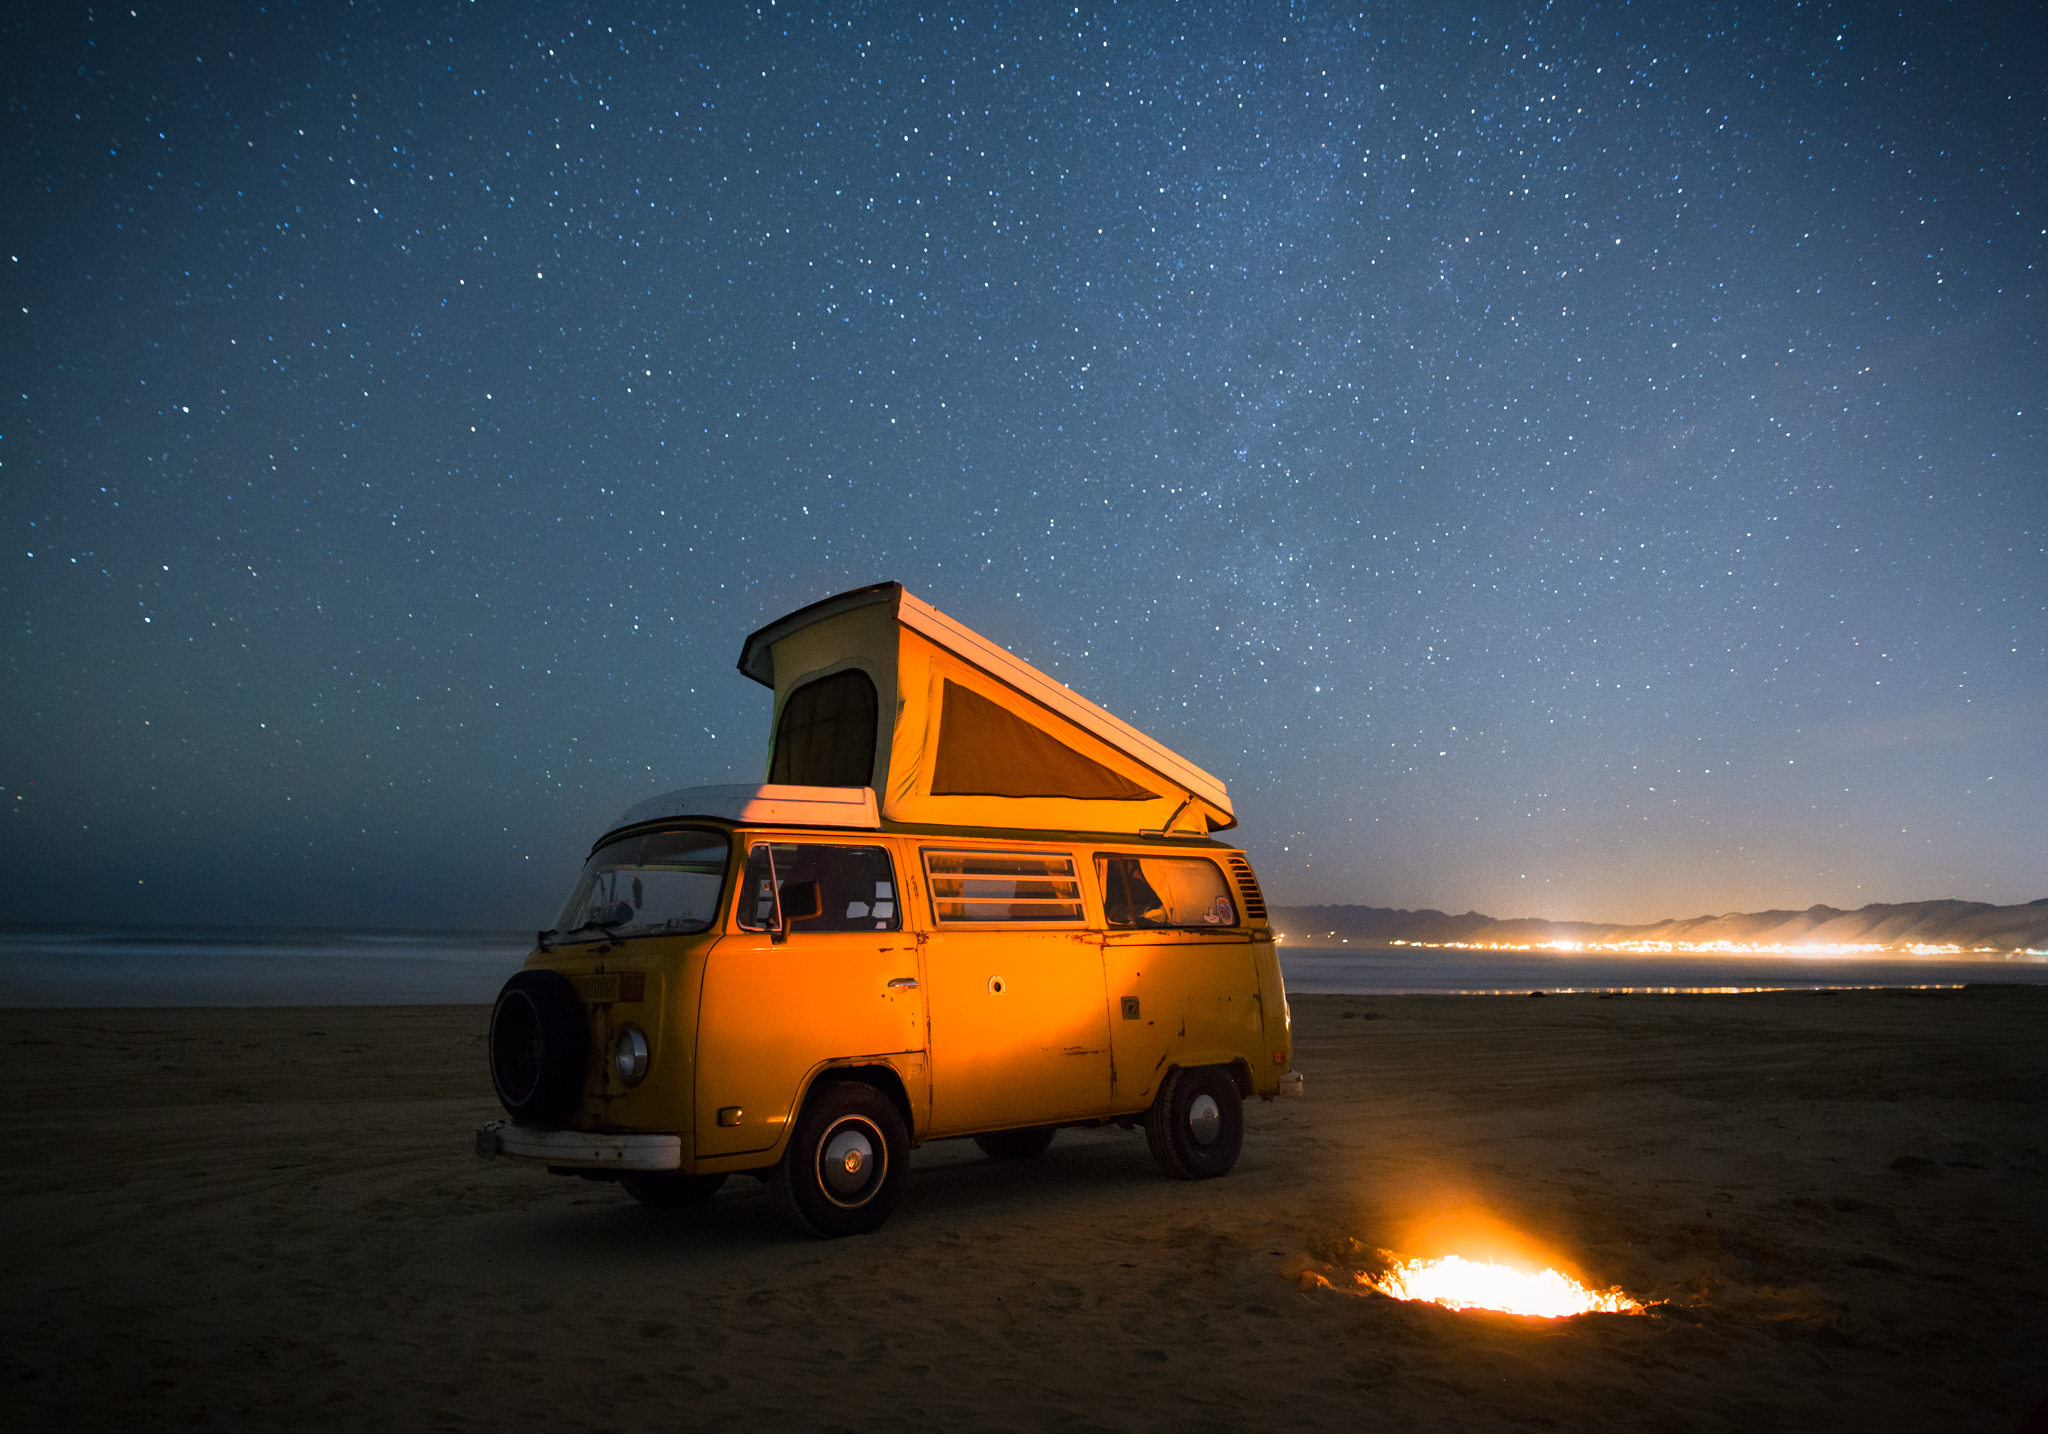 Pismo Beach Camping, California - Taylor Burk copy.jpg